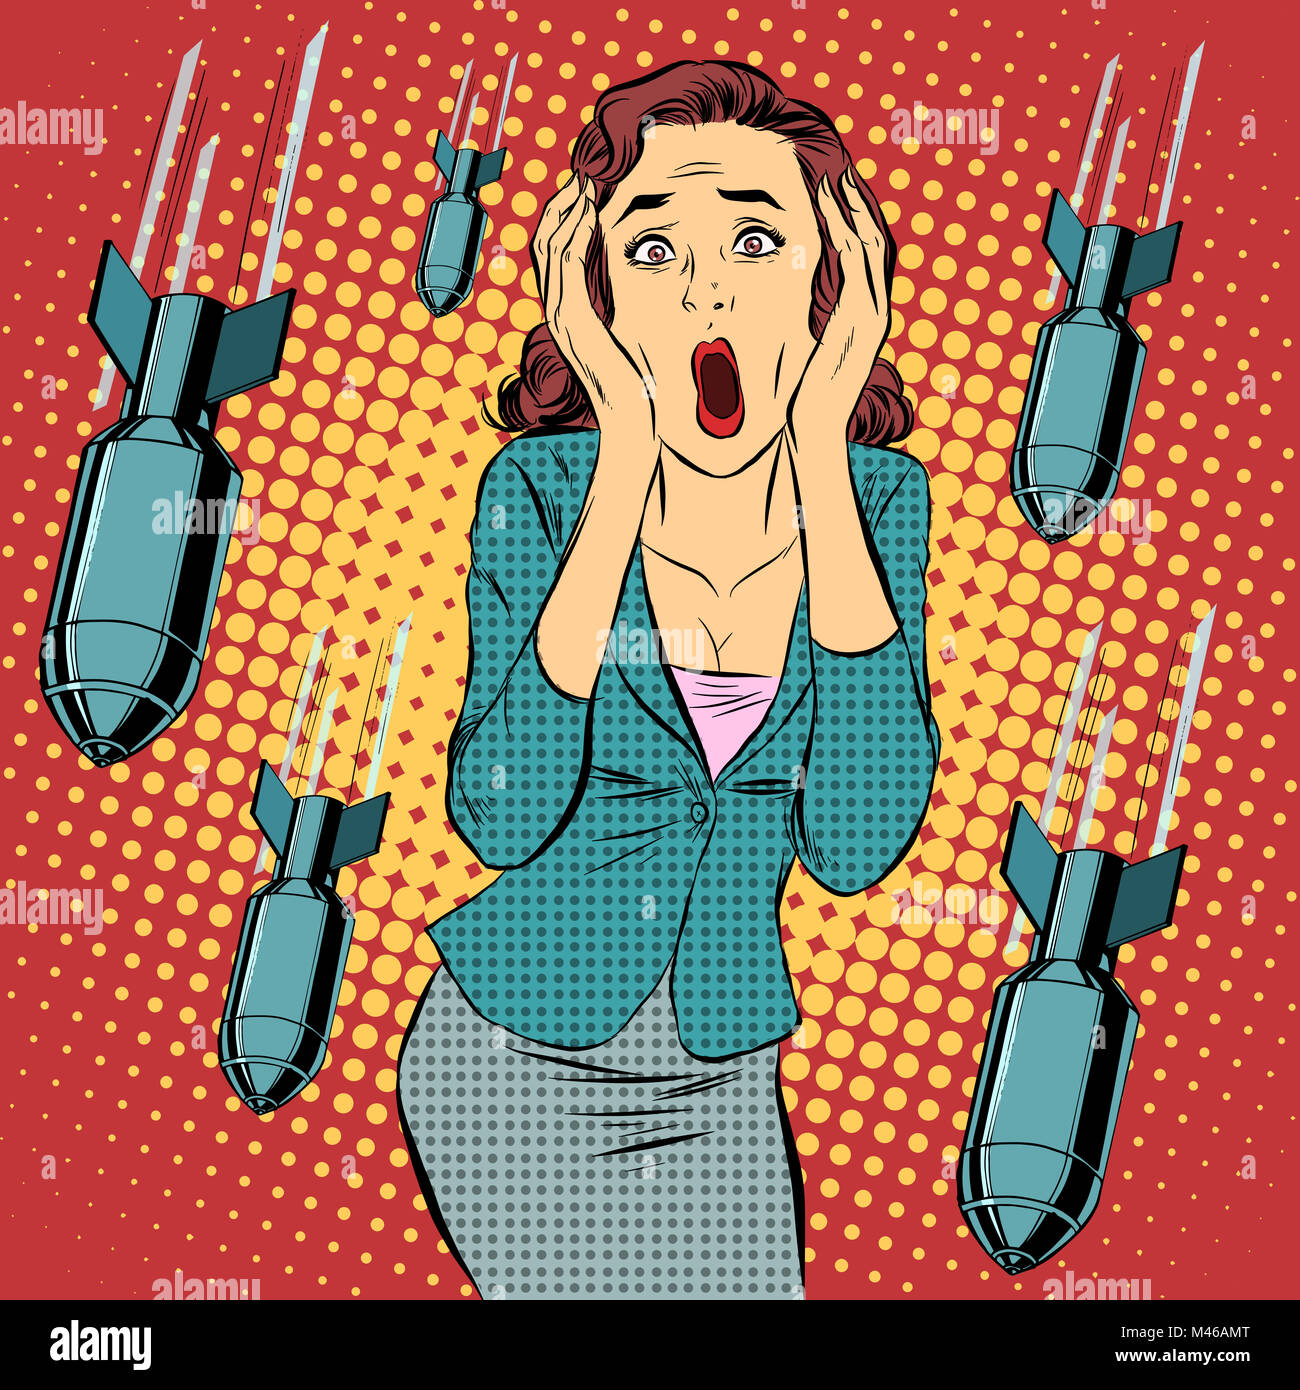 War bombing civilian woman panic horror - Stock Image